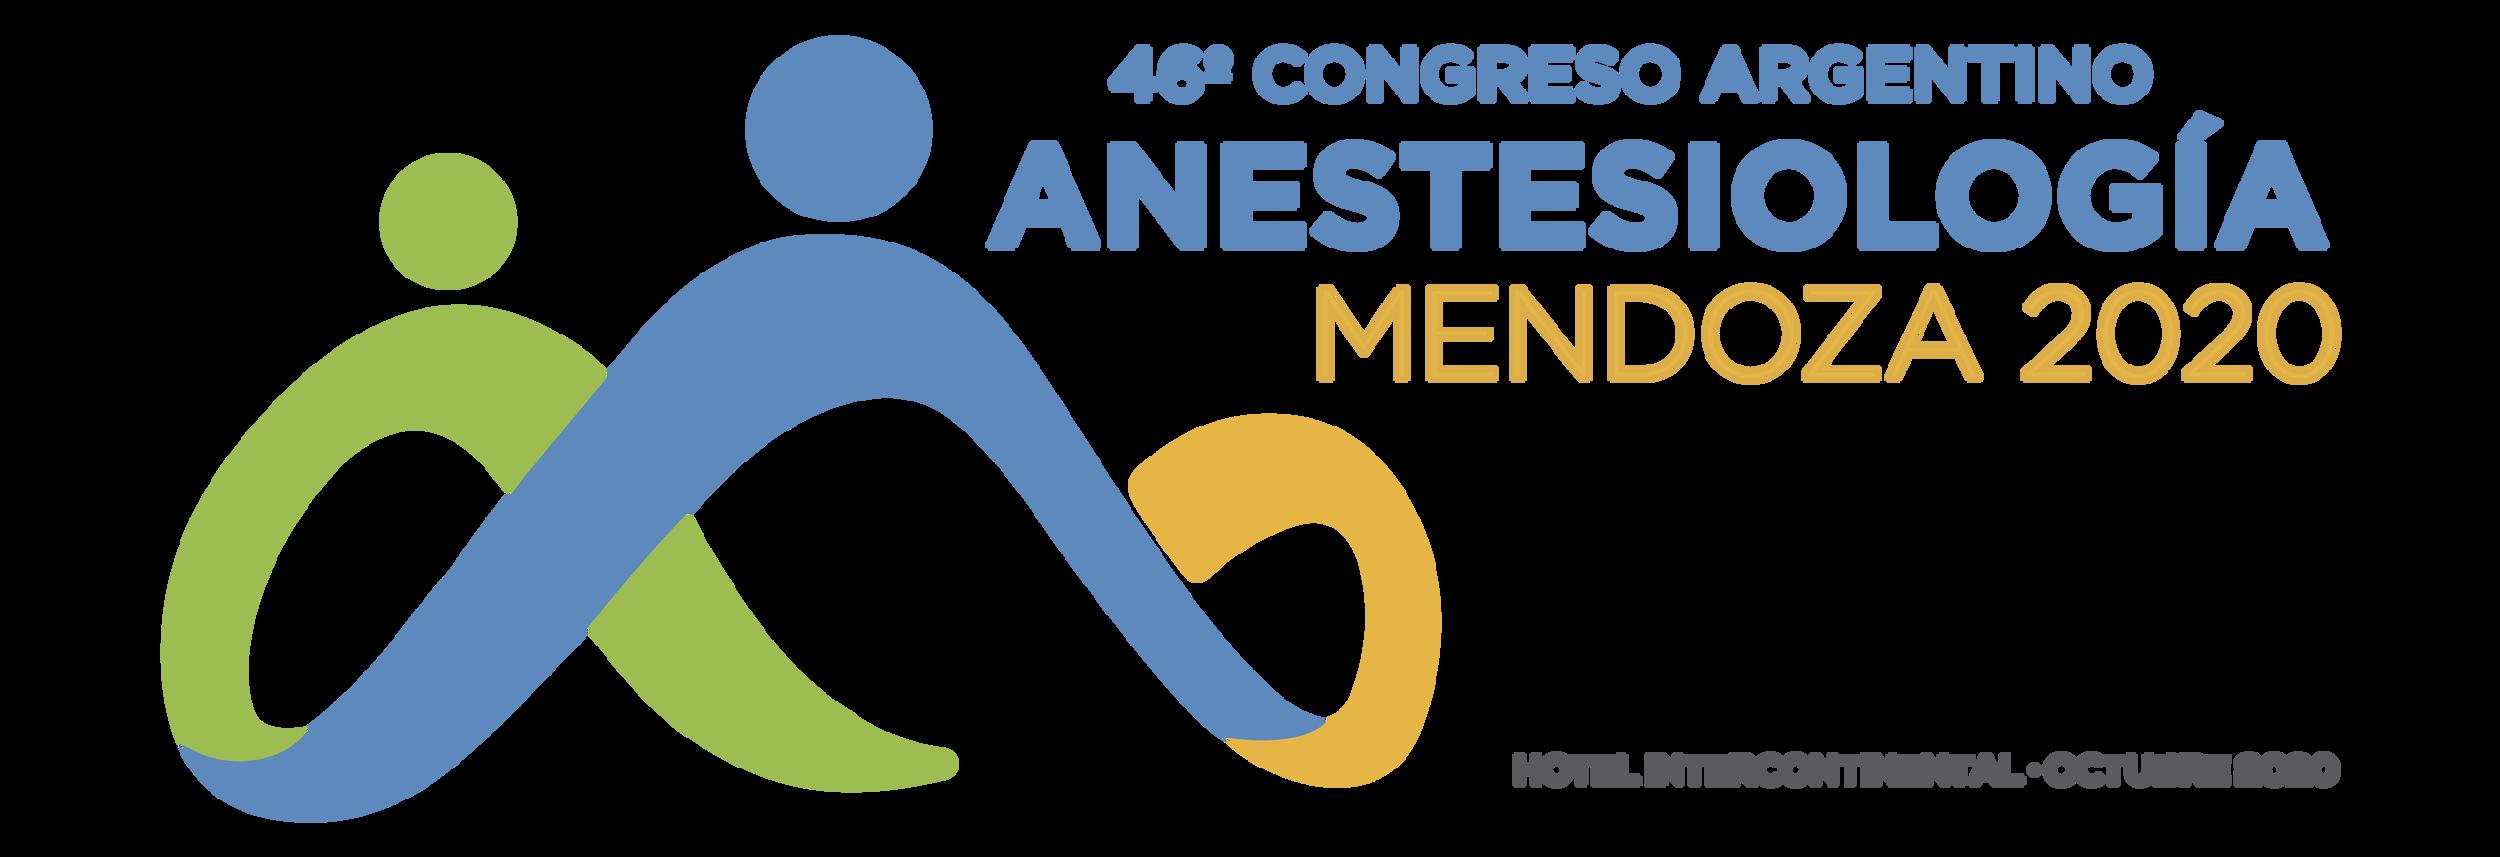 46° Congreso Argentino de Anestesiología